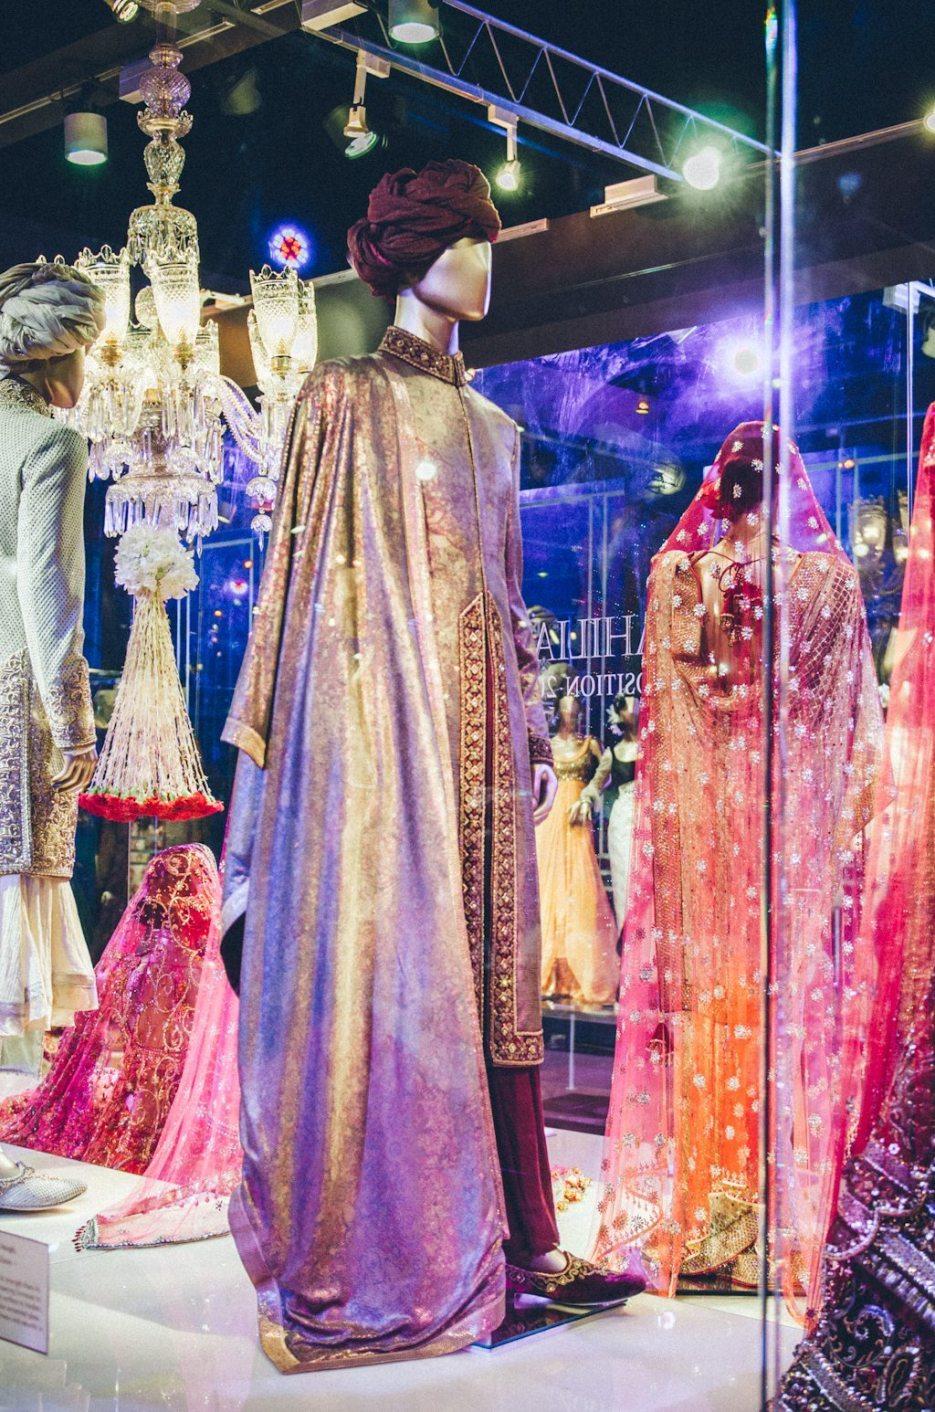 Tarun-Tahiliani-Bridal-Couture-Wedding-Wear-Fashion-Designer-Photographer-Naina-Knottytales-39.jpg